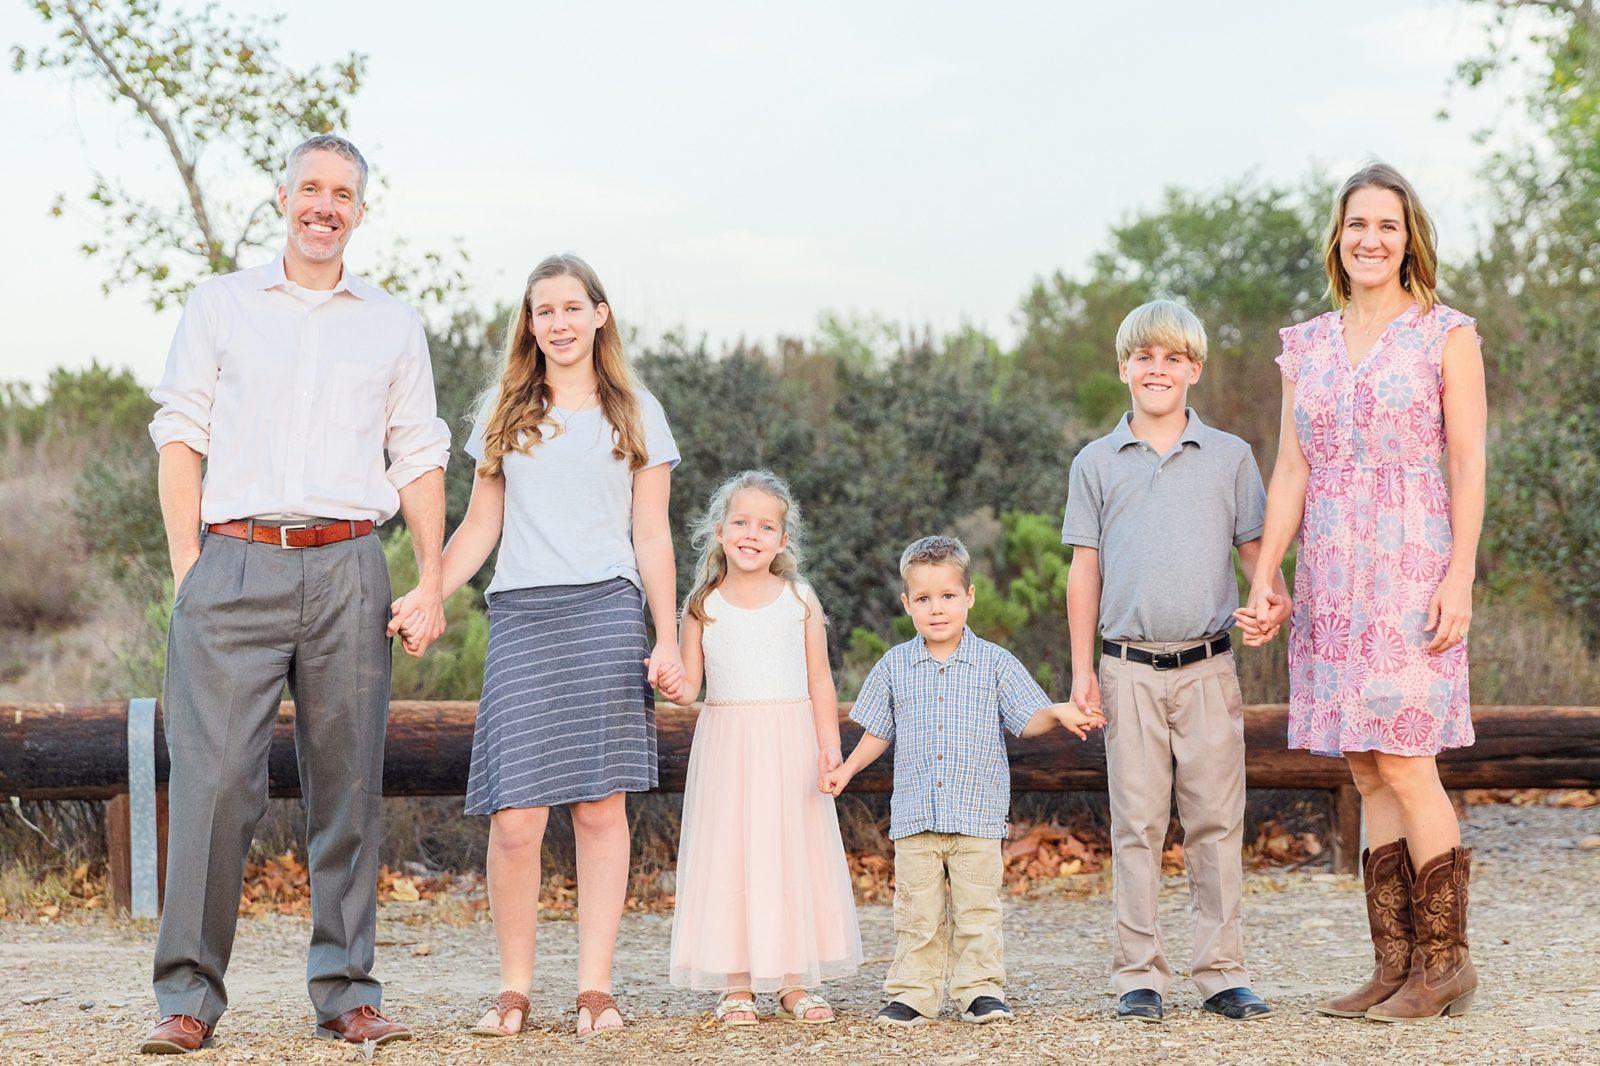 Family Photo | San Diego Family Photography